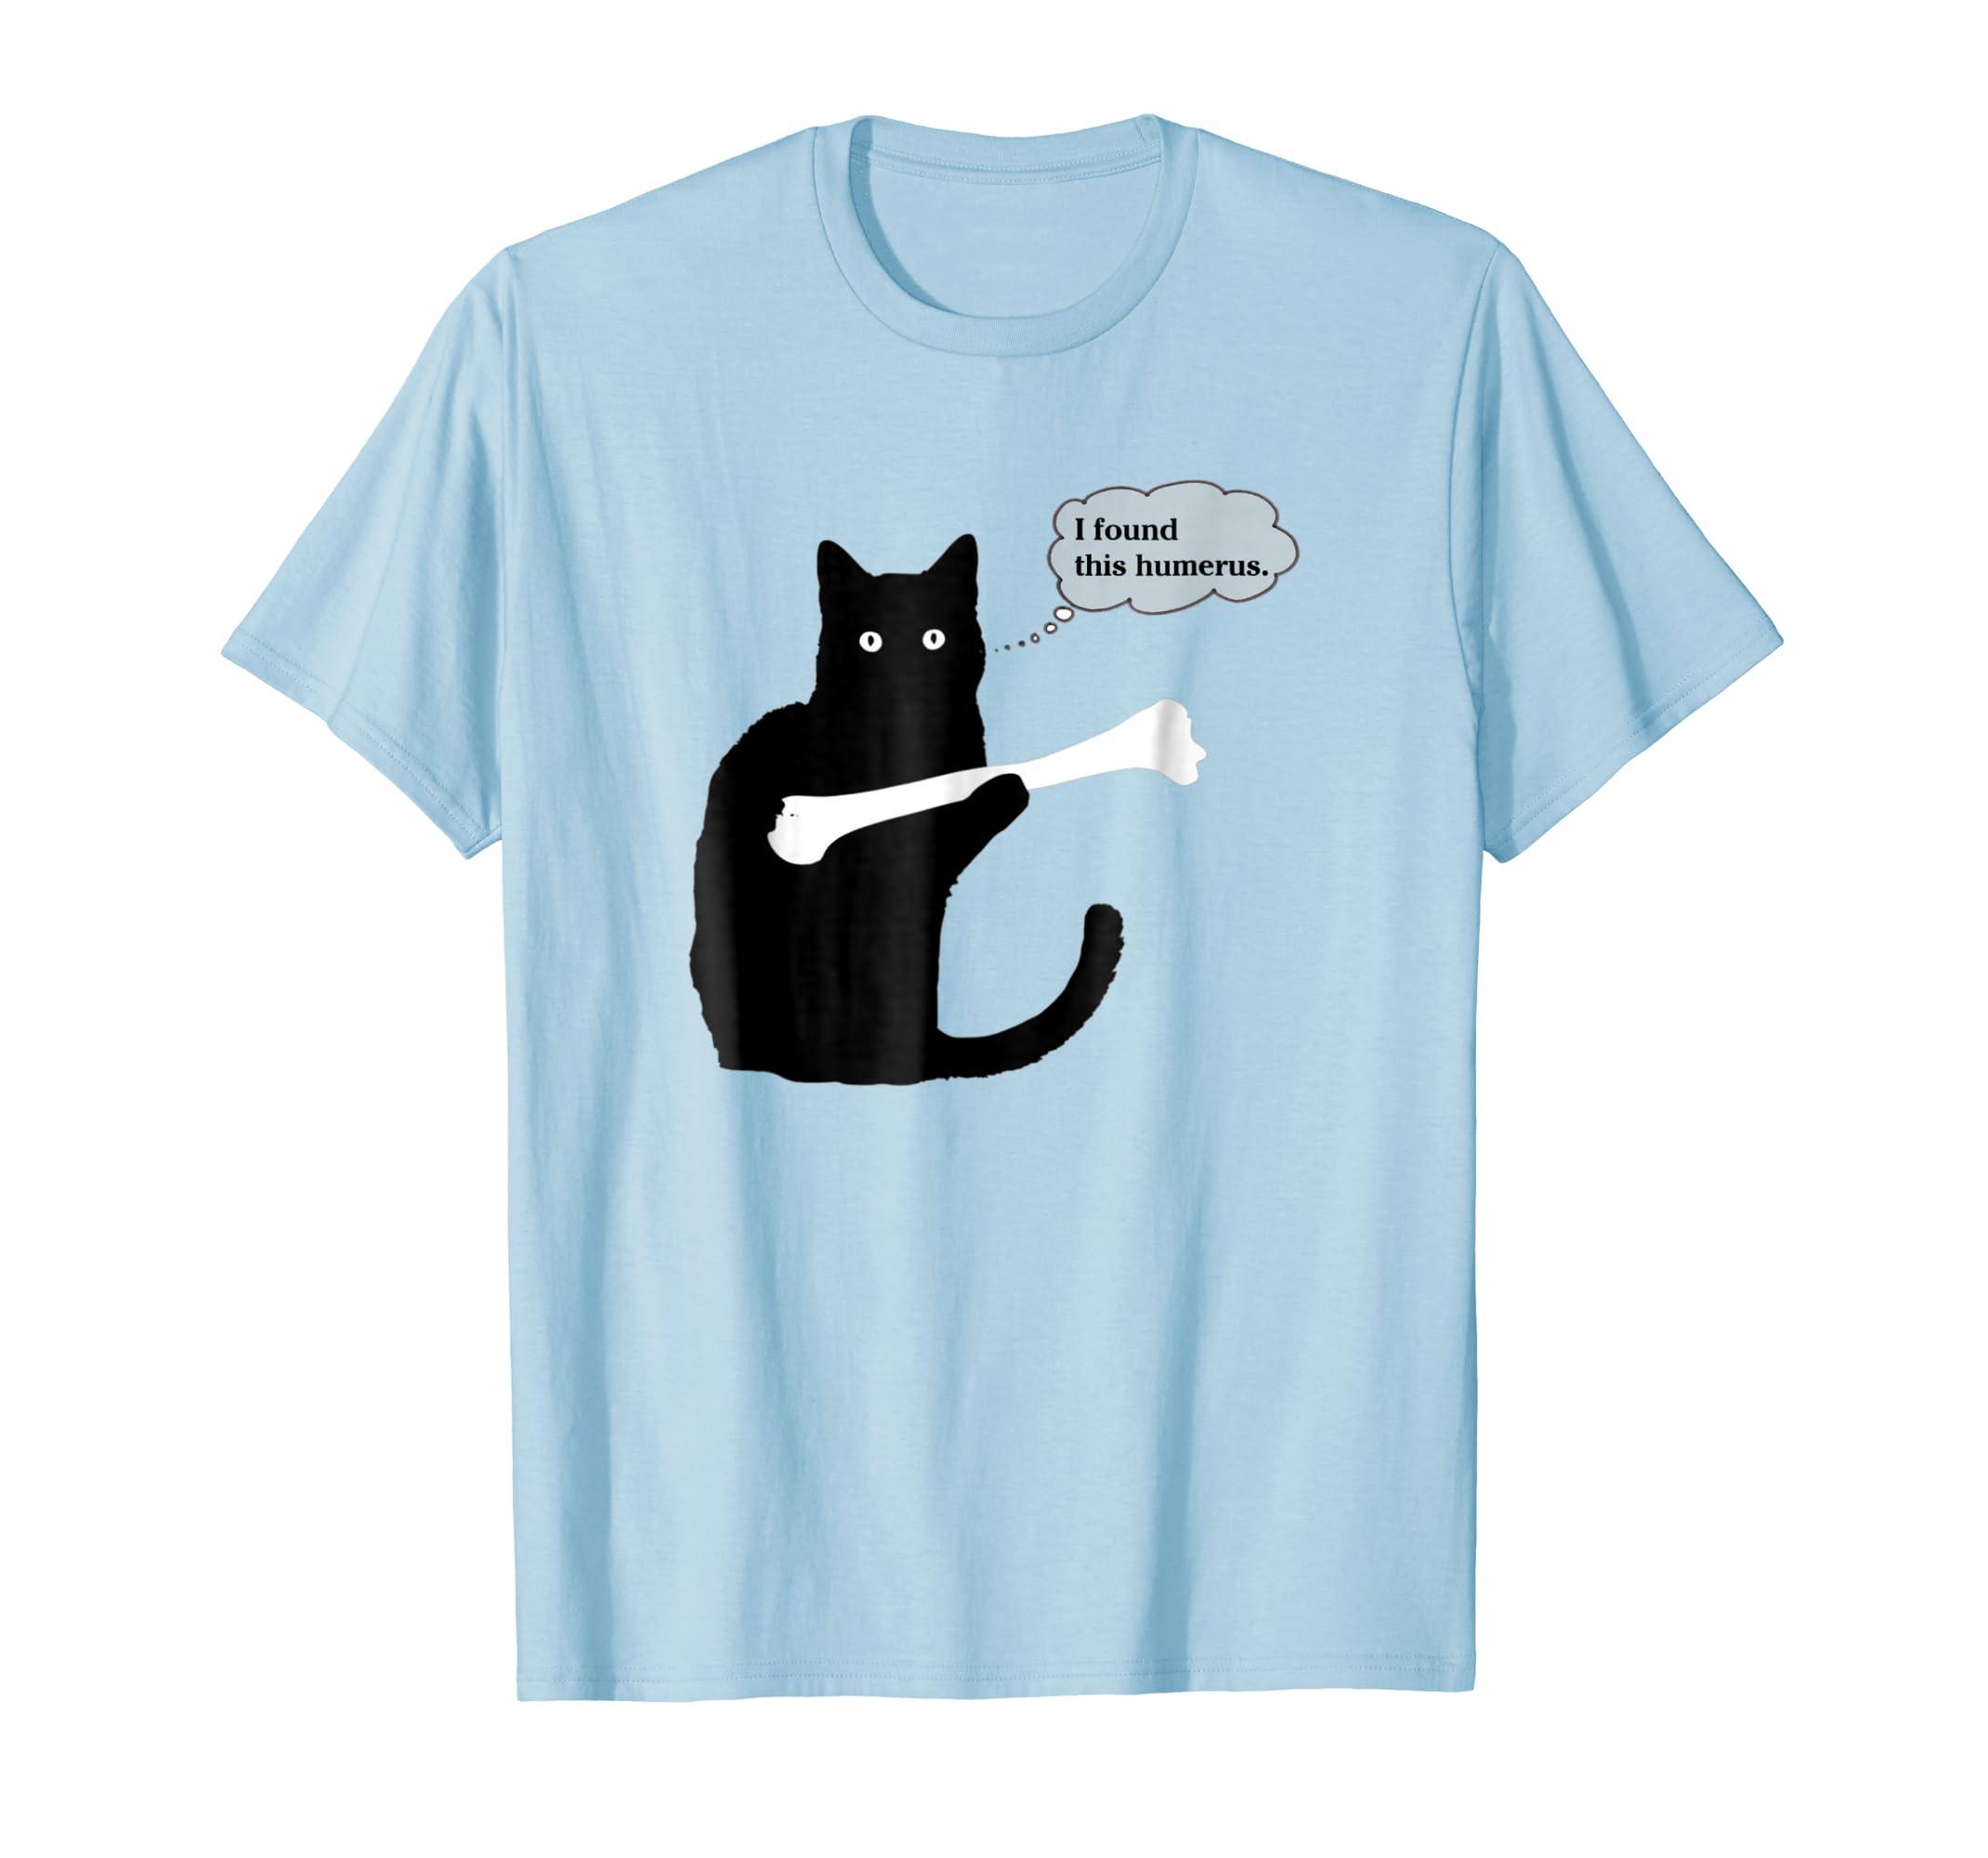 7701270c9 I Found This Humerus Cats Humorous T Shirt-Colonhue – Colonhue.com